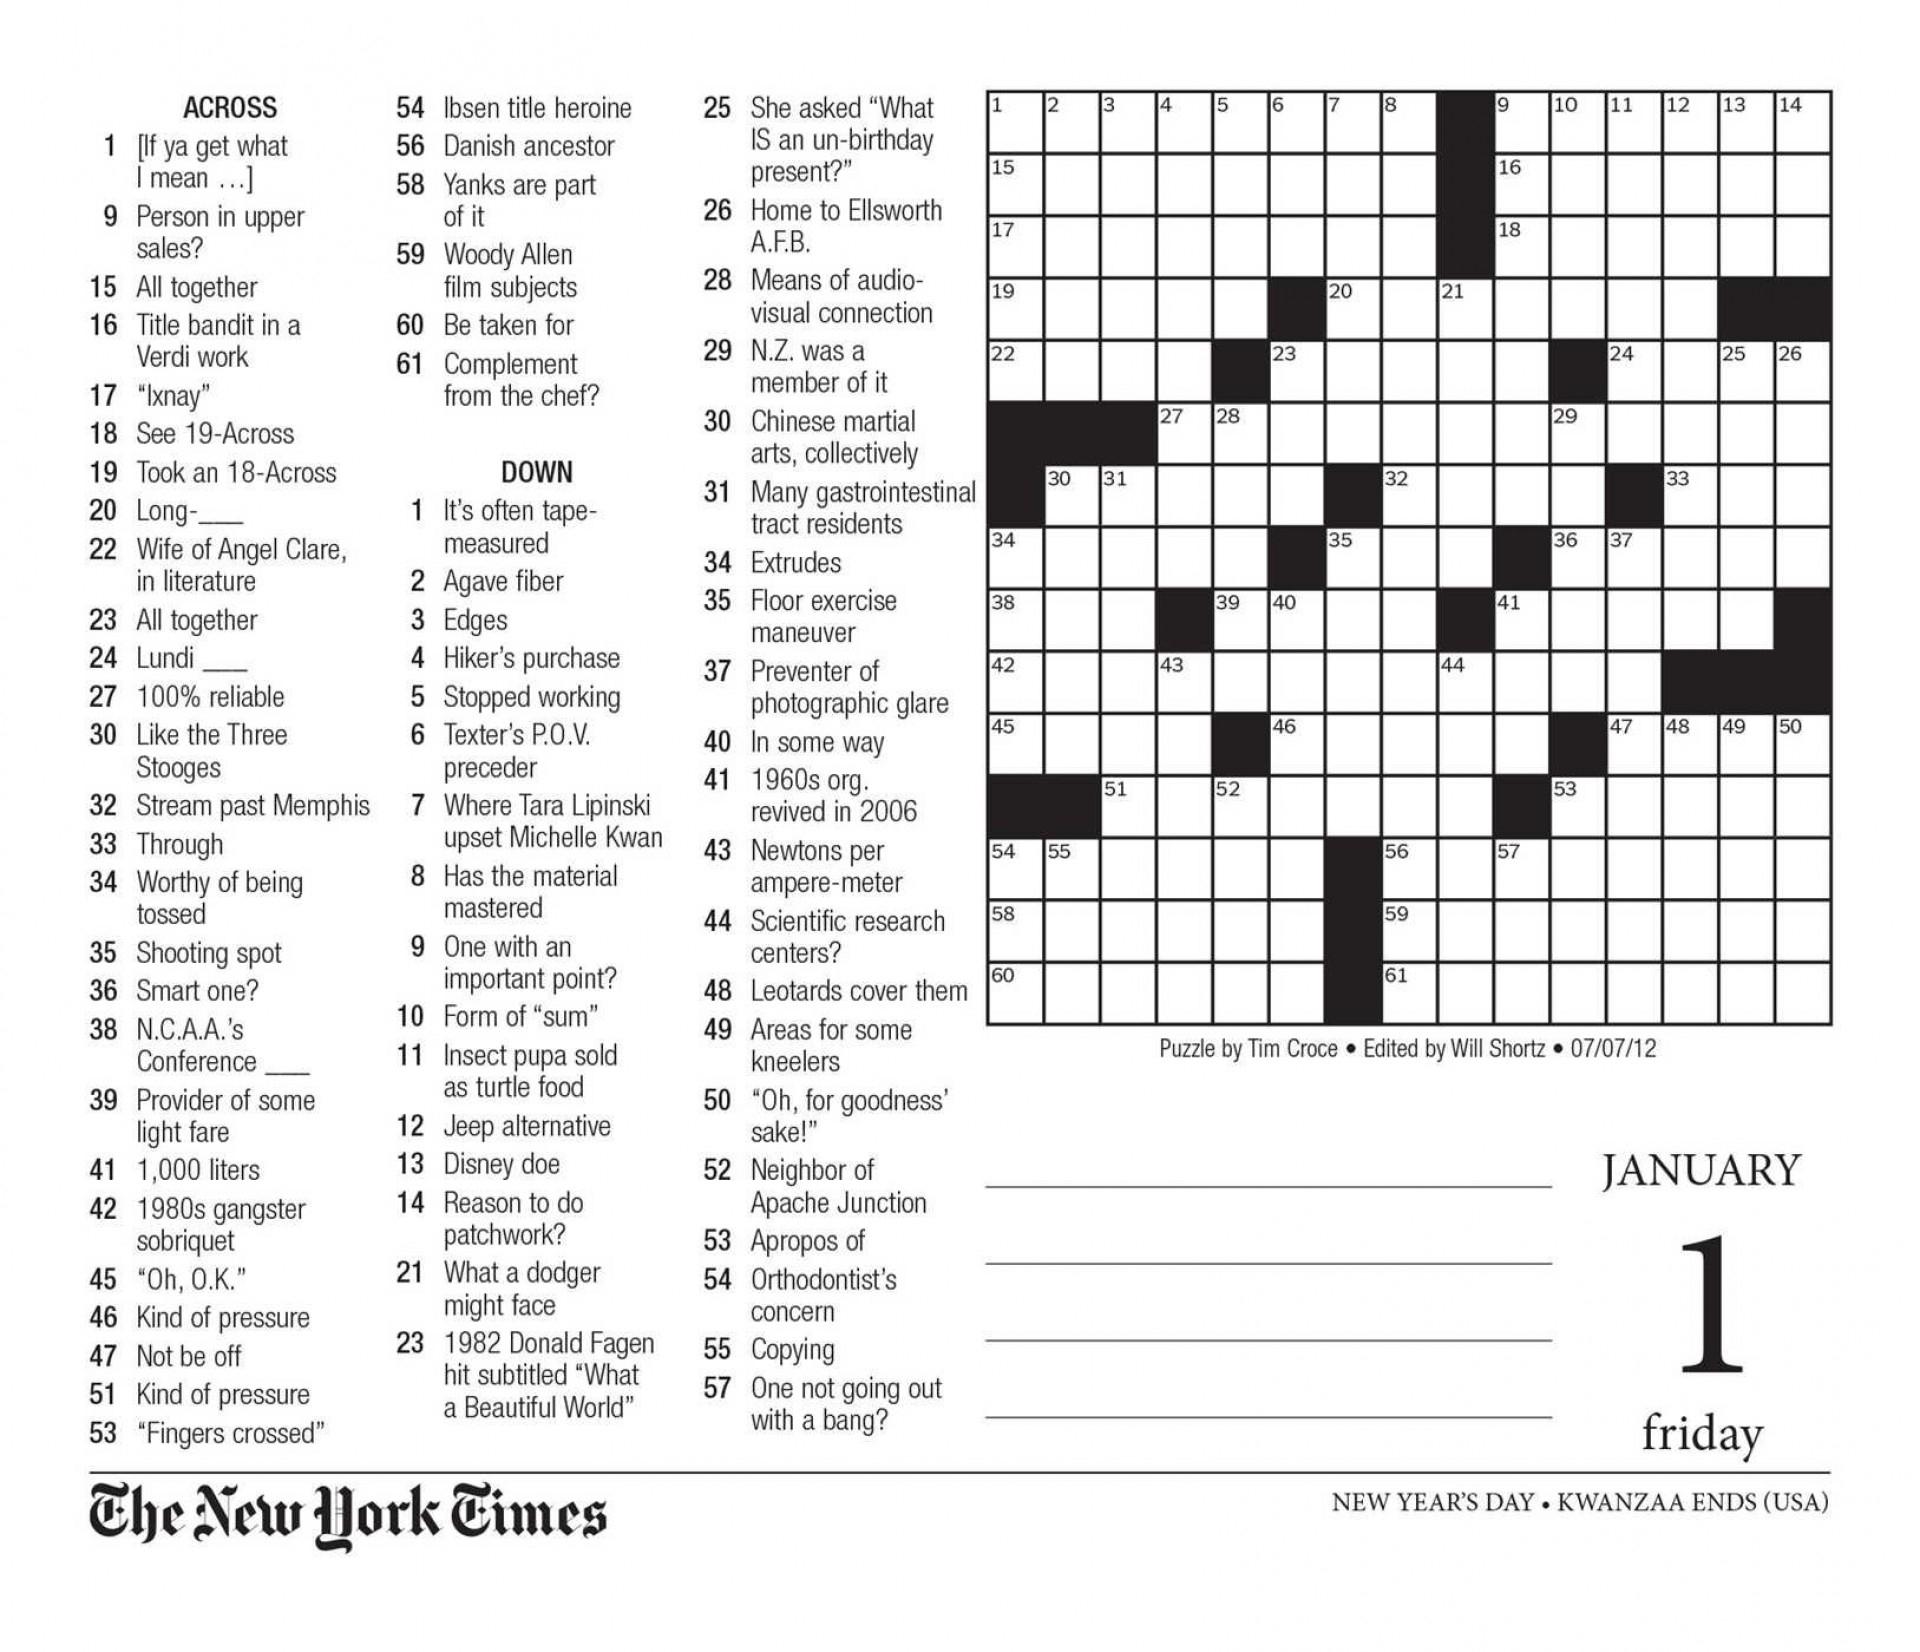 Free Printable Large Print Crossword Puzzles   M3U8 - You Magazine Printable Crossword Puzzles